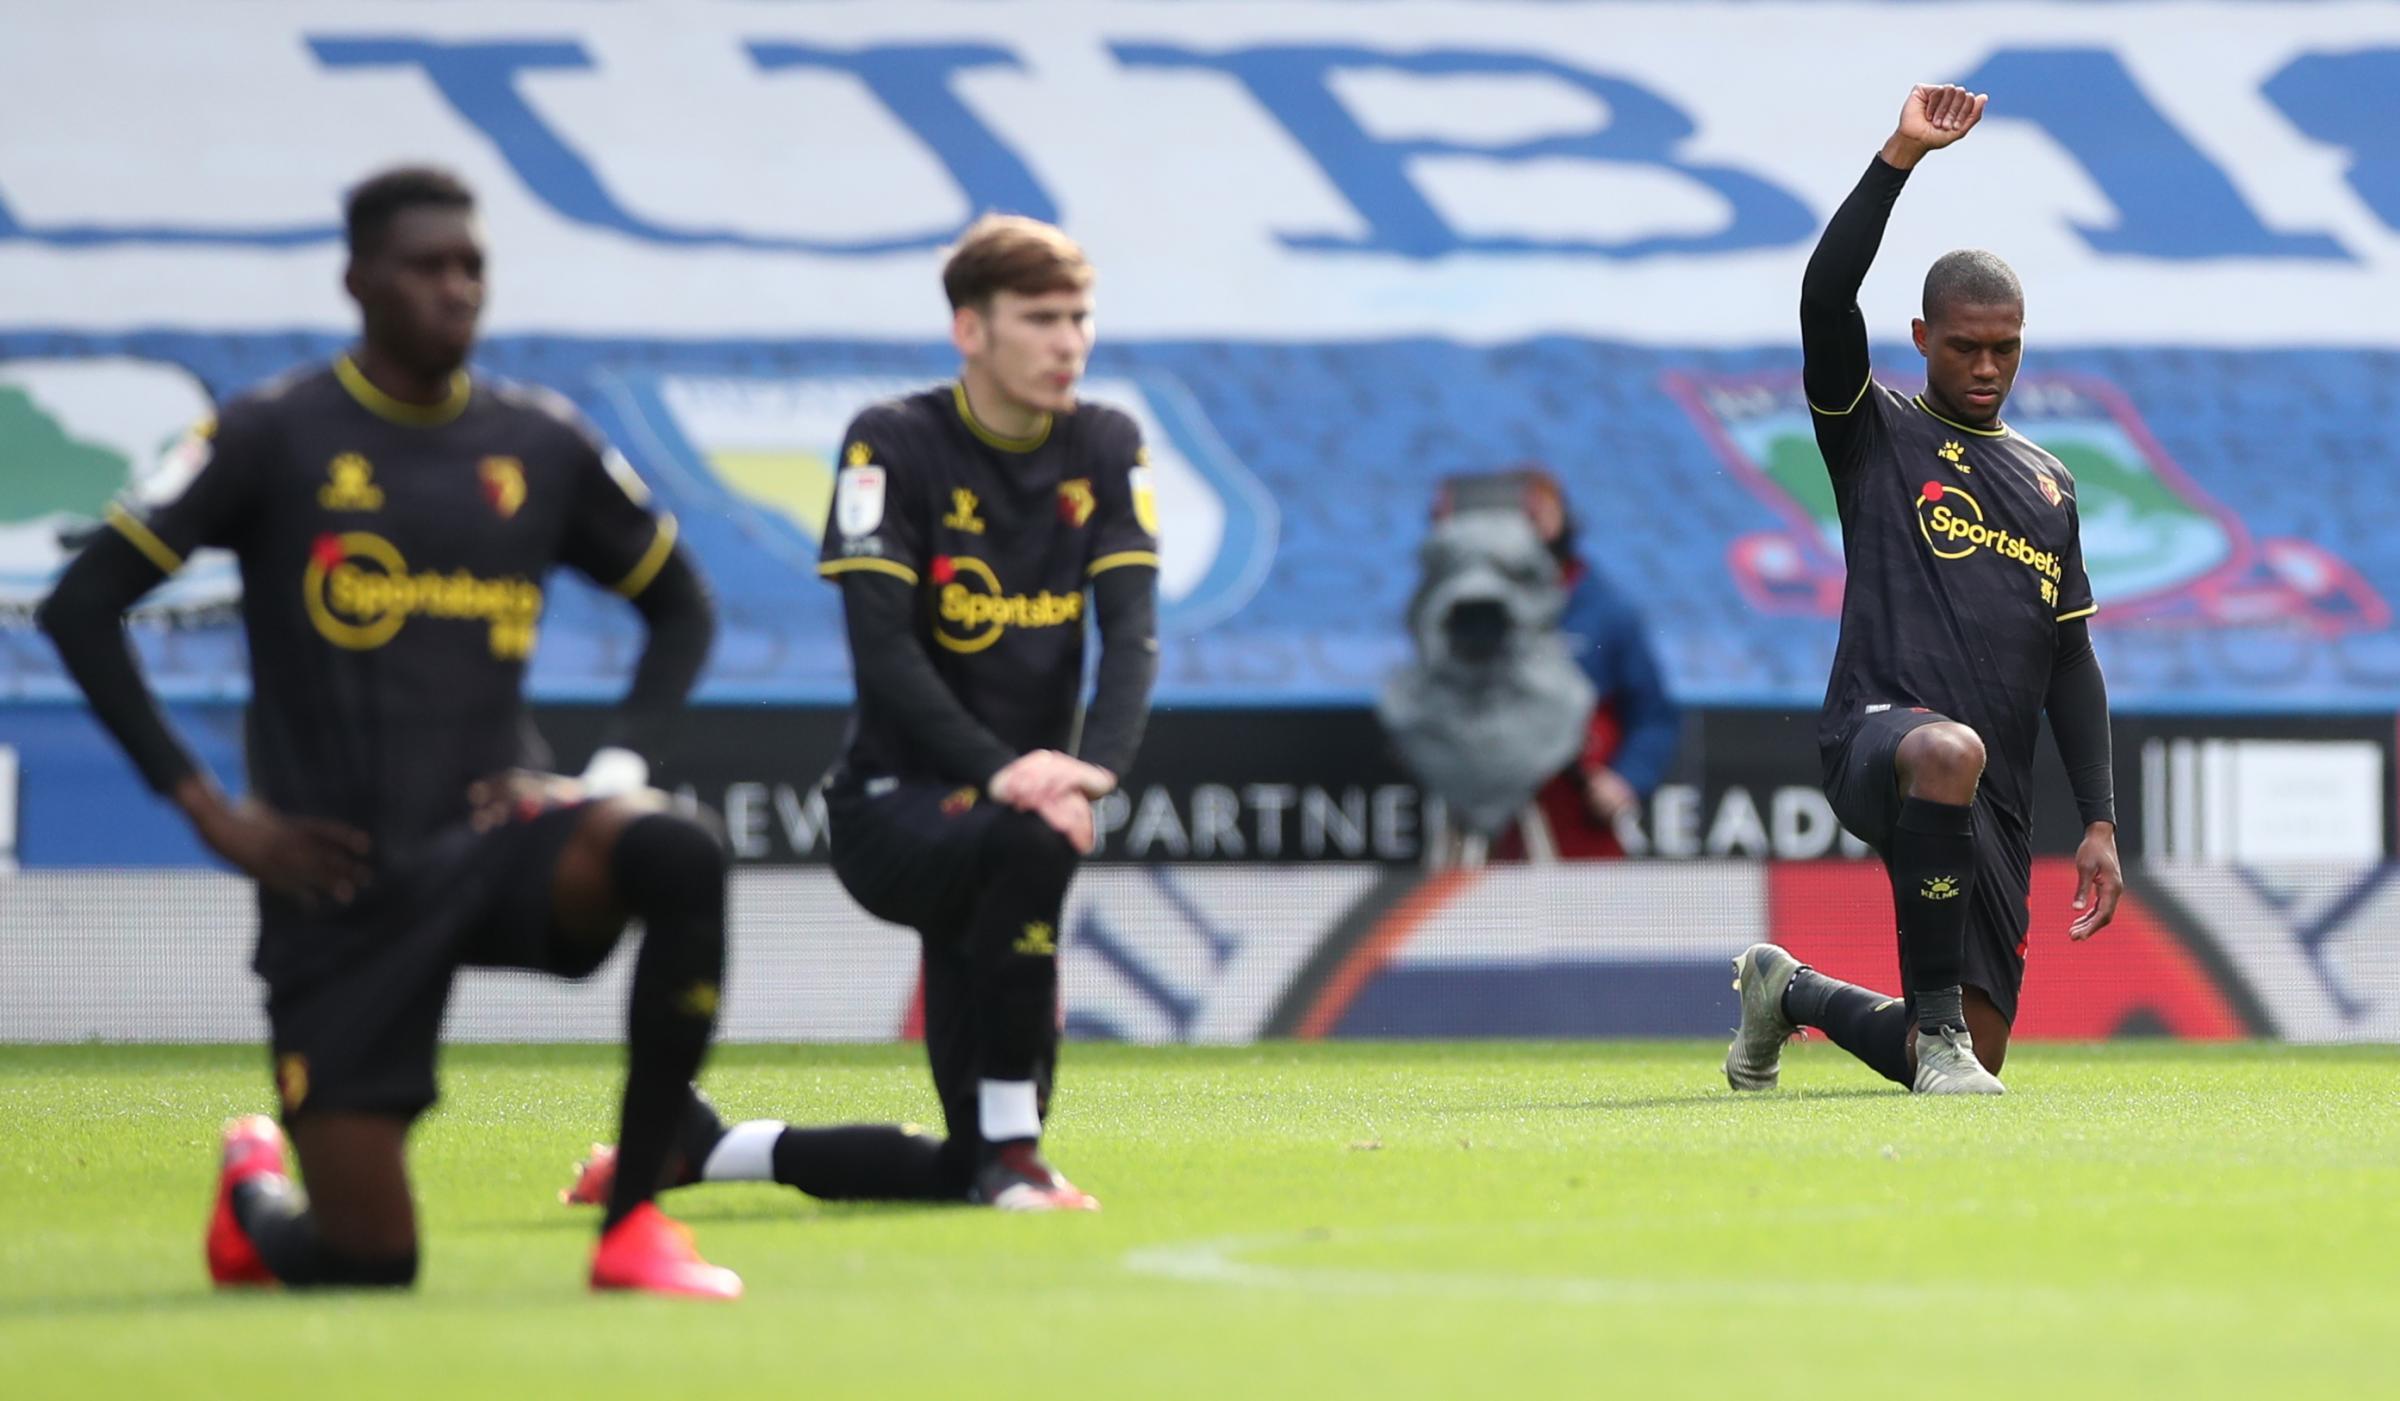 Premier League players to take the knee next season